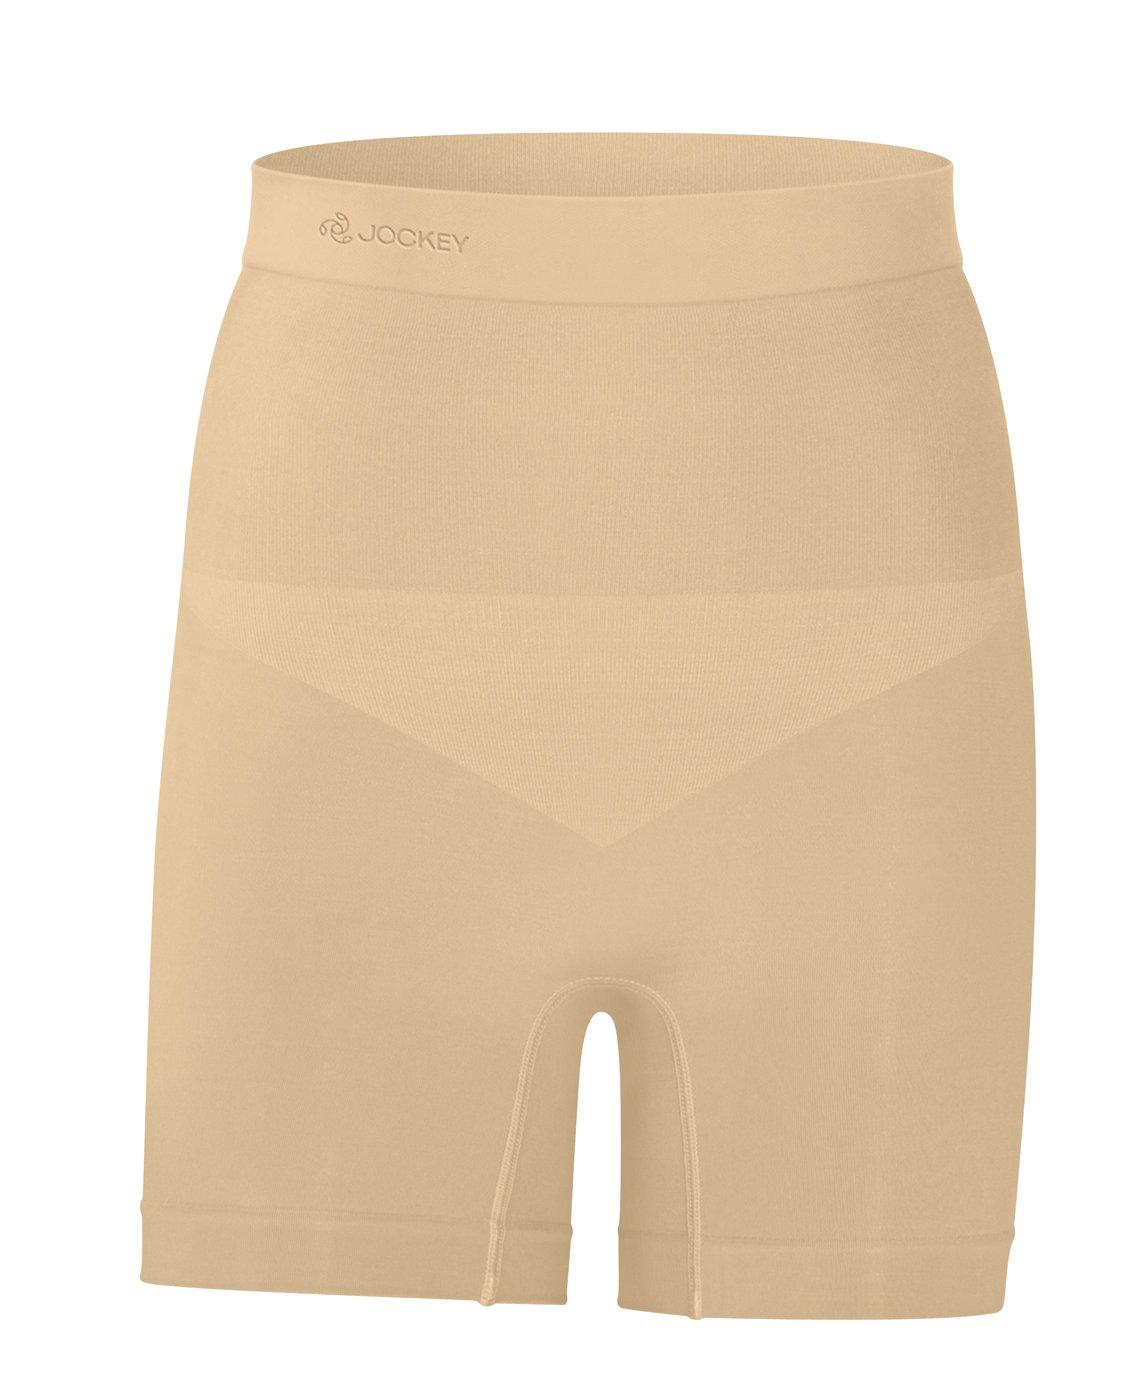 Jockey Seamless Shapewear High-Waist Short Iced Frappe Size S